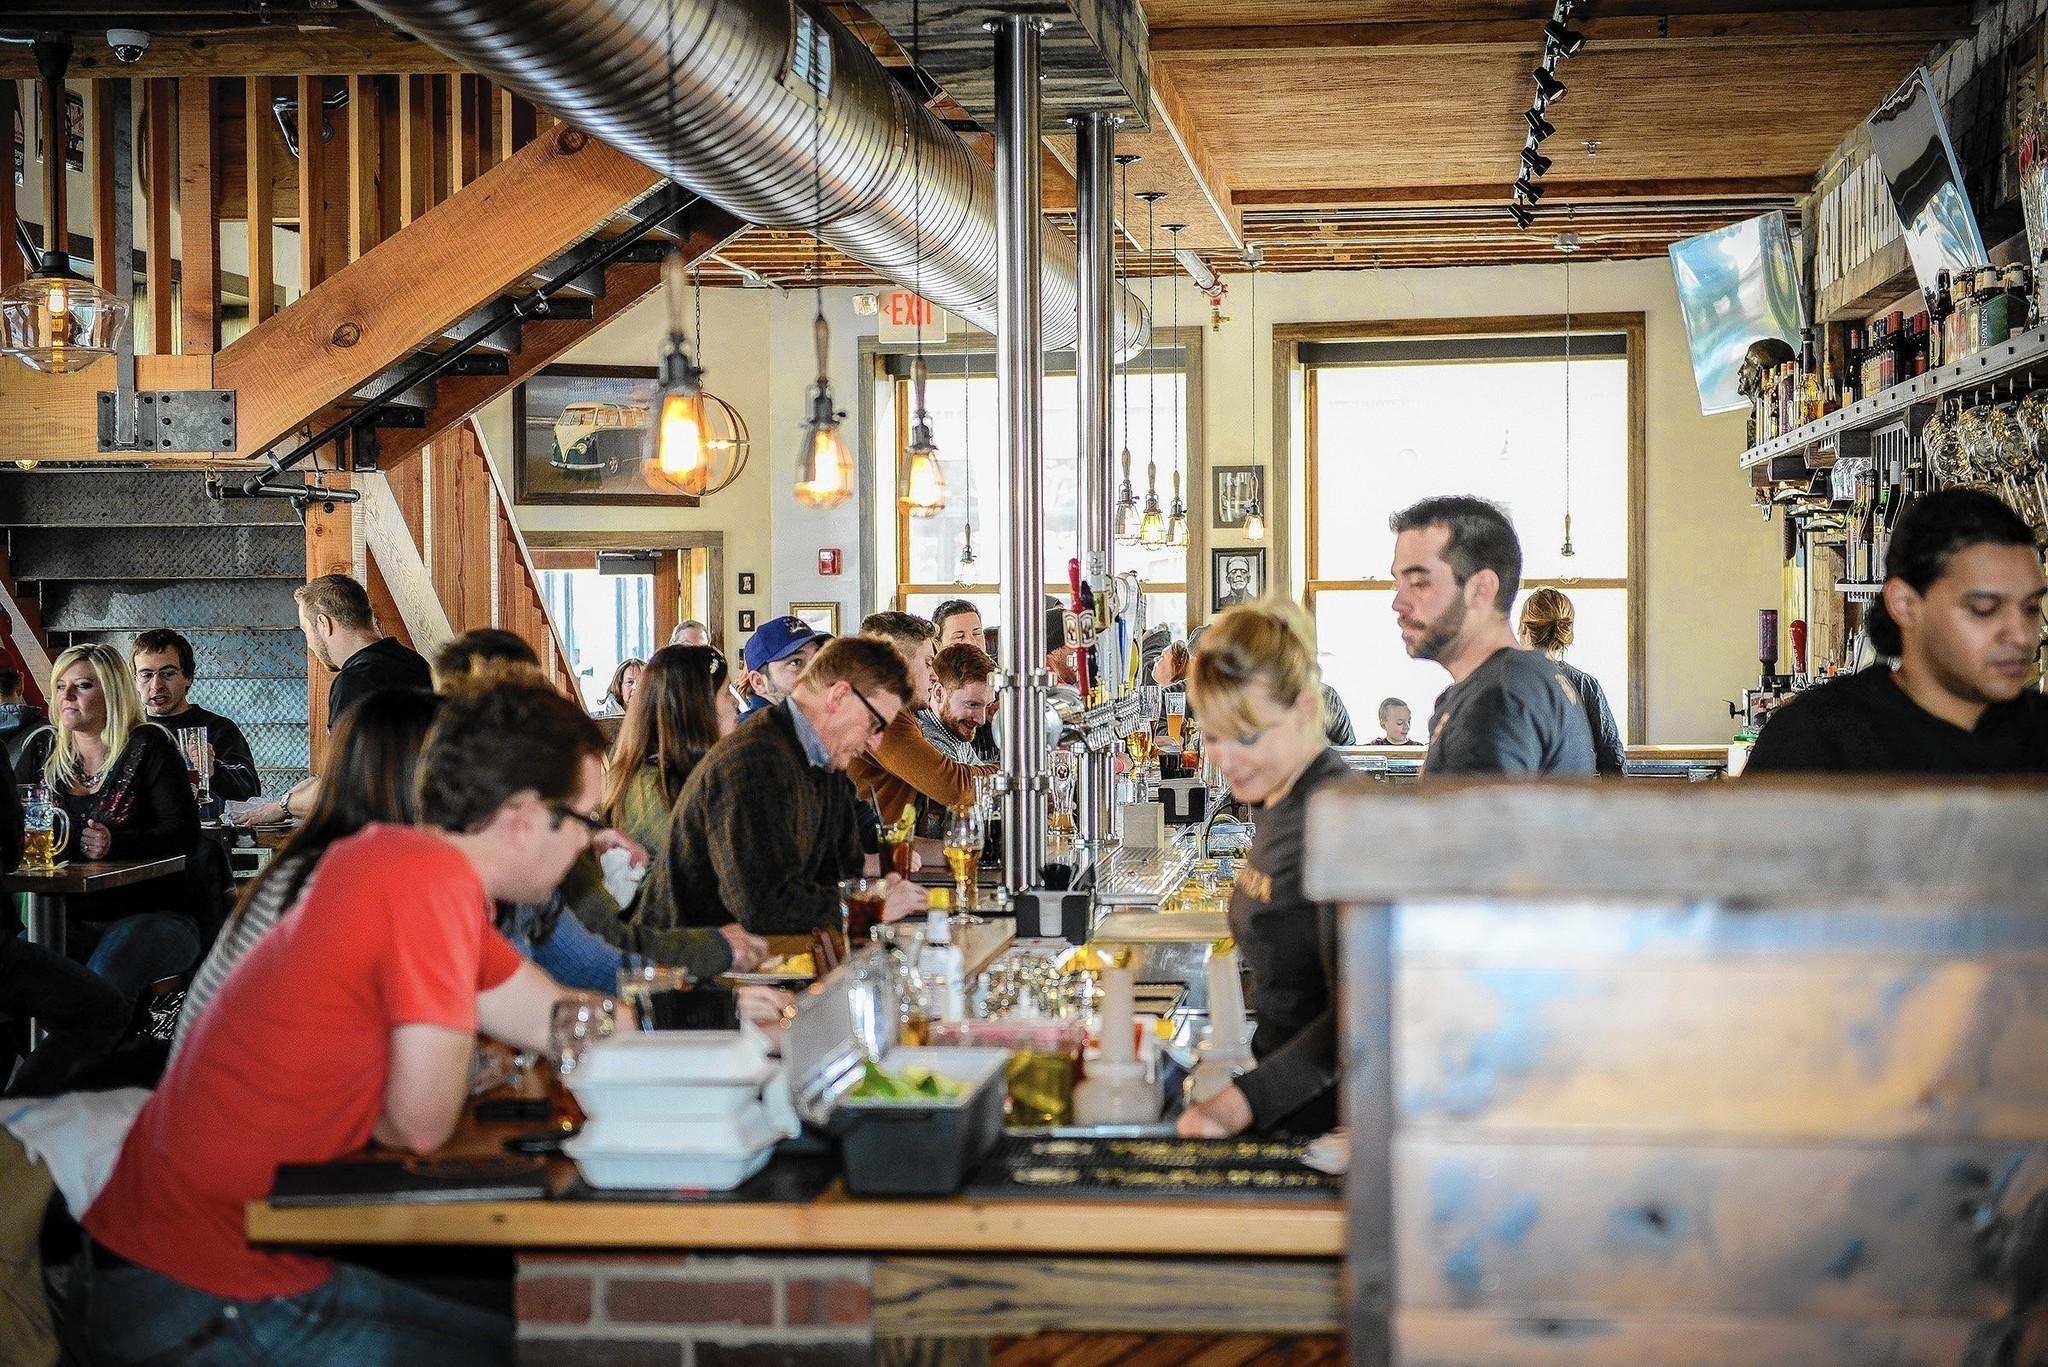 Tasty Tosa Milwaukee Suburb Stocked With Worthy European Cuisine Chicago Tribune